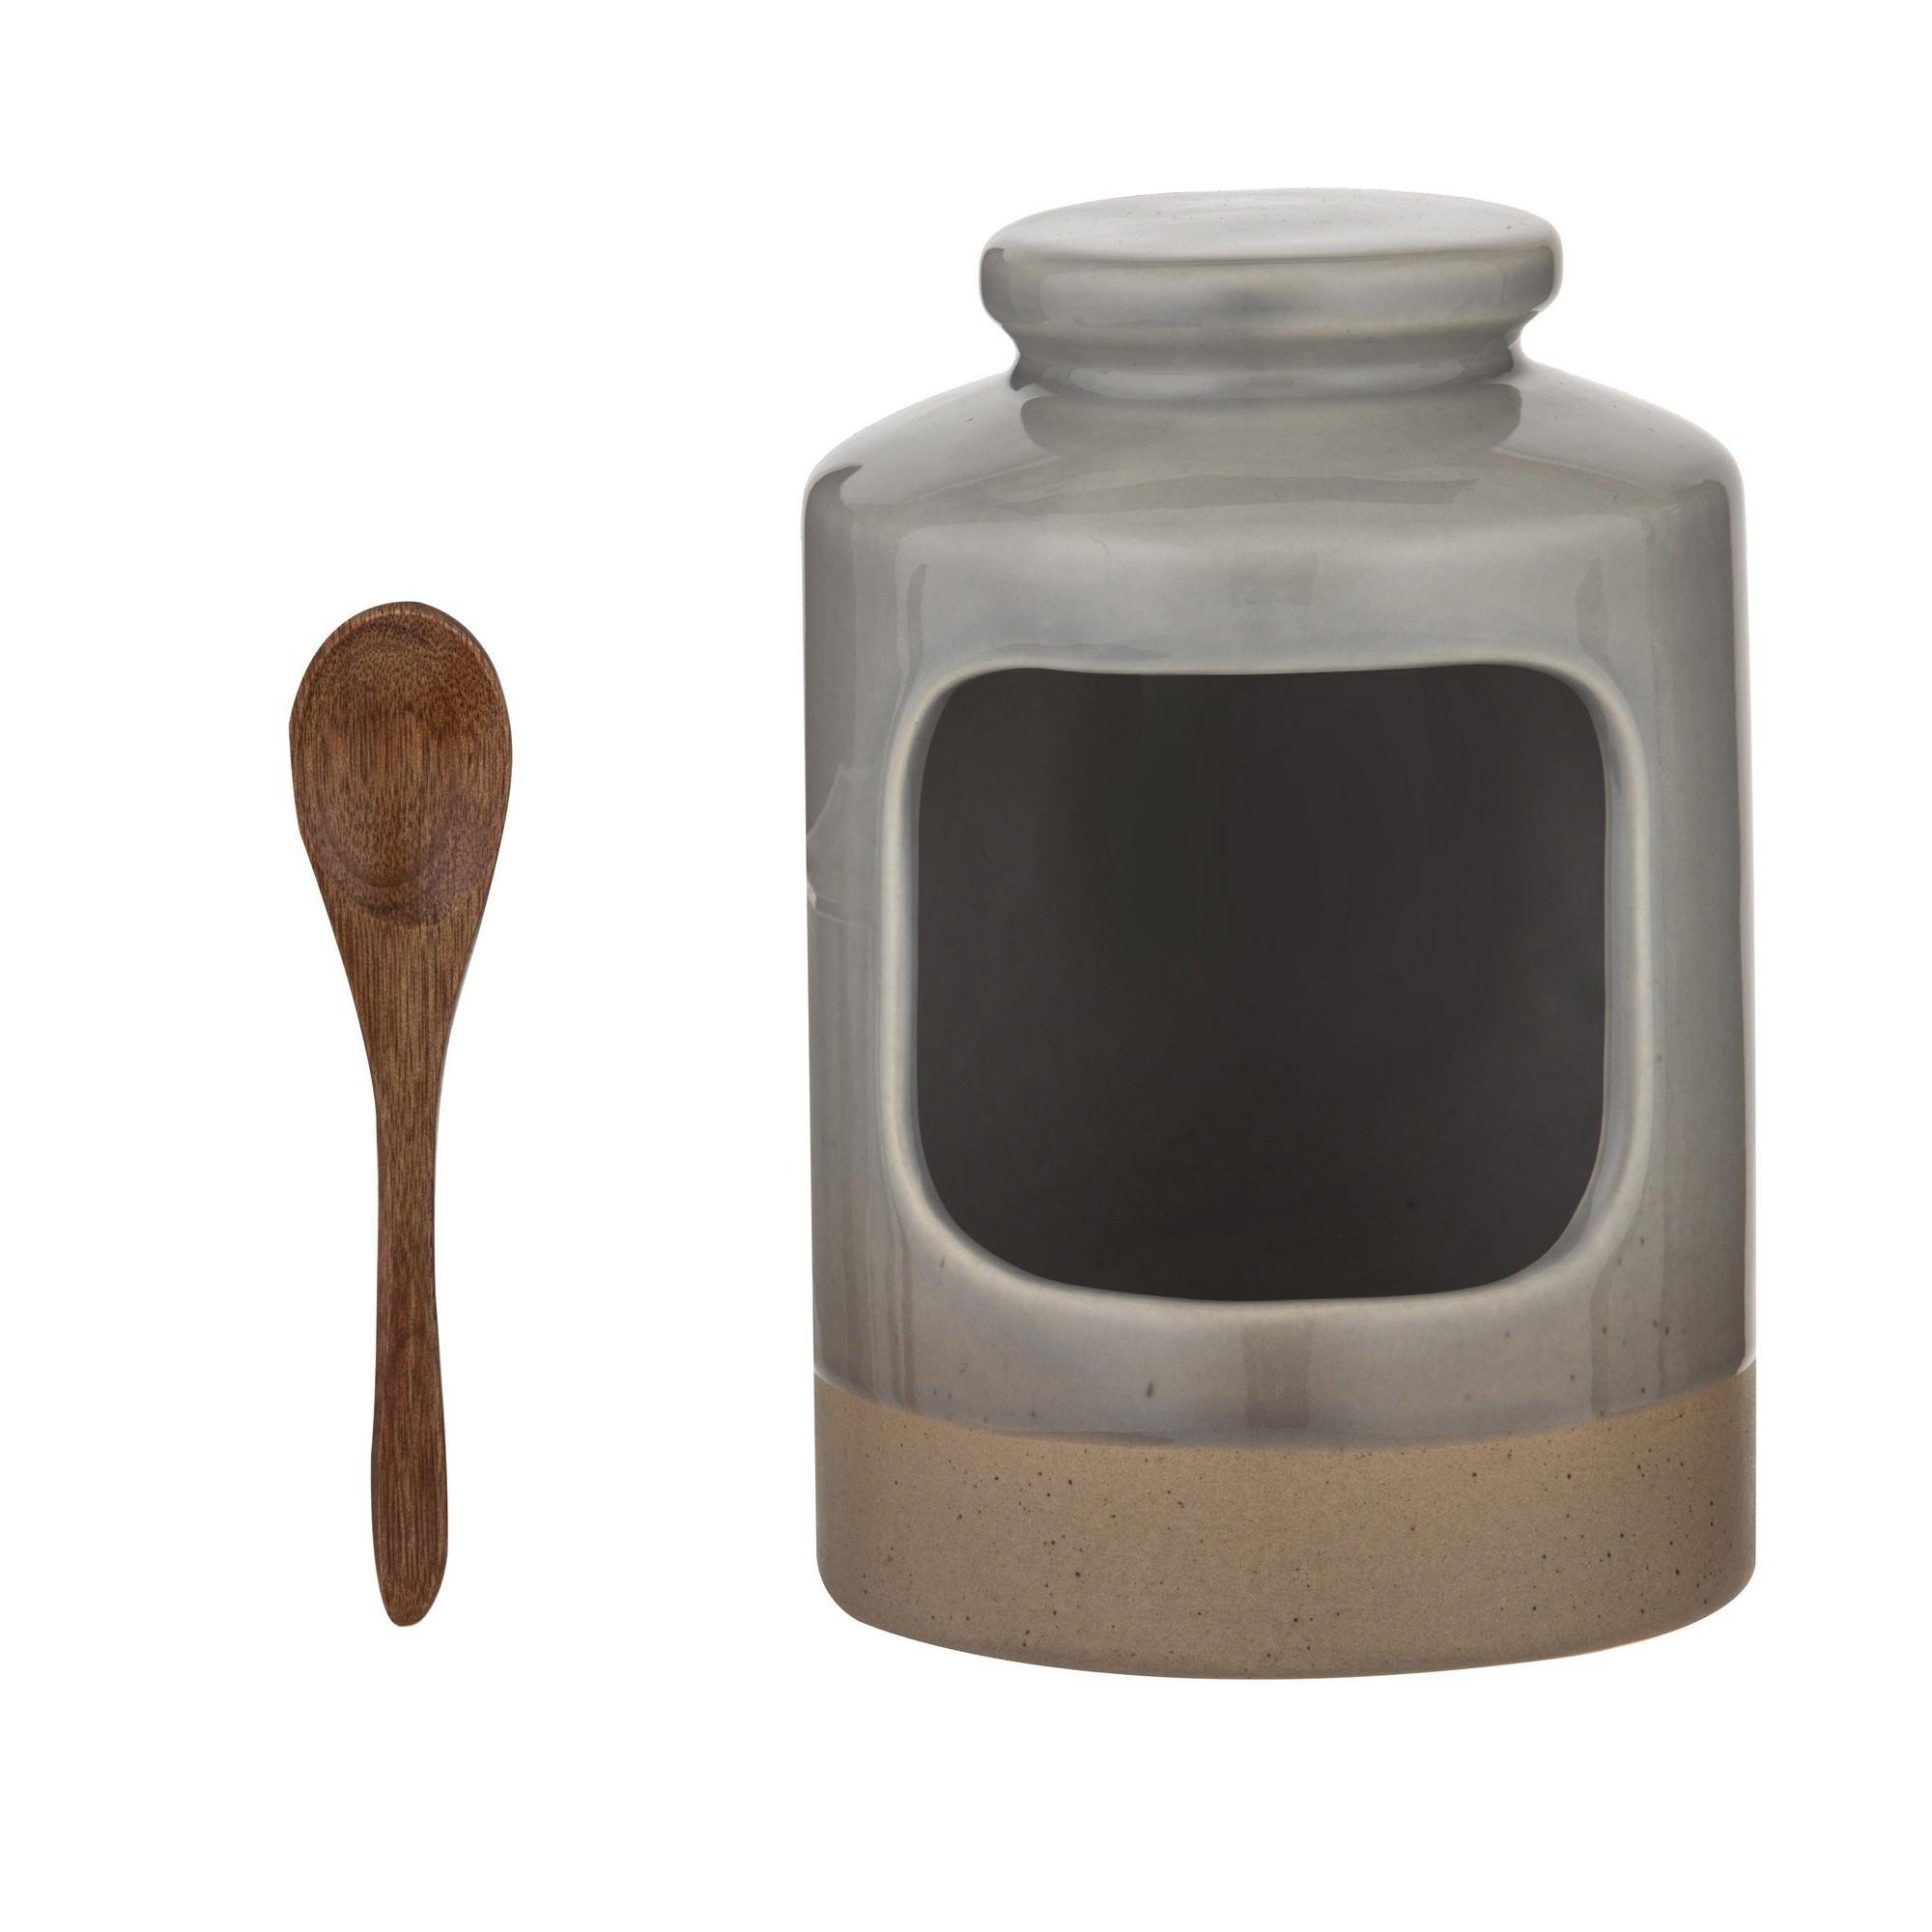 Davis & Waddell Essence Jenson Ceramic Salt Pig